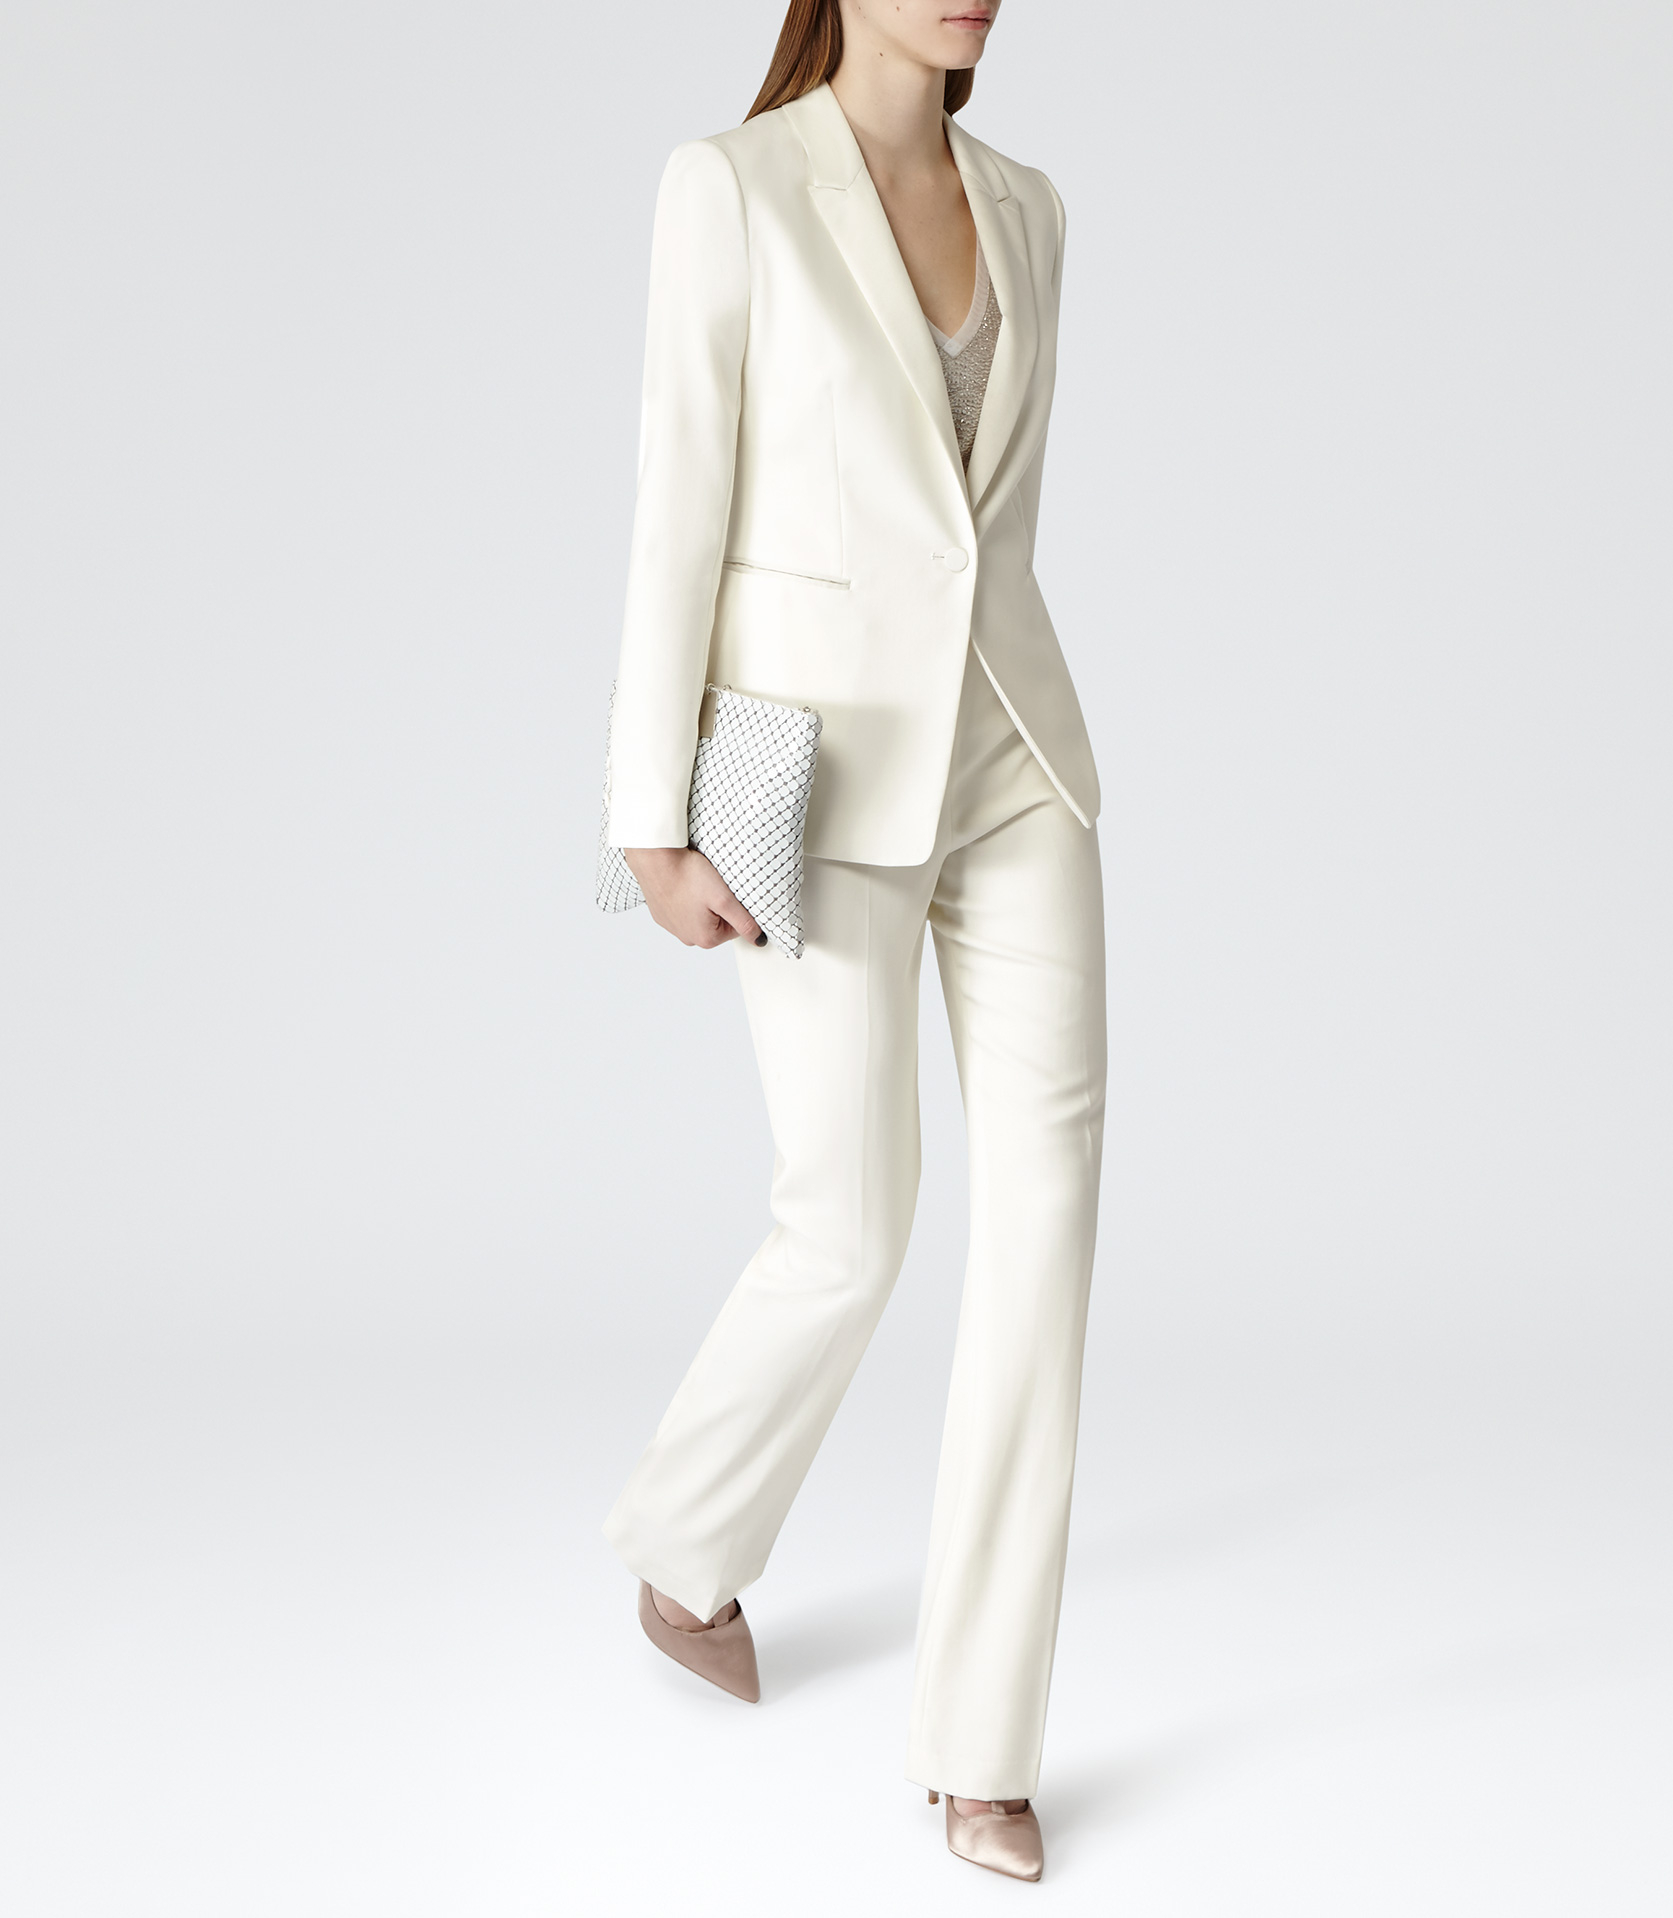 Reiss Pfeiffer Slim-Fit Wool Blazer in Natural | Lyst